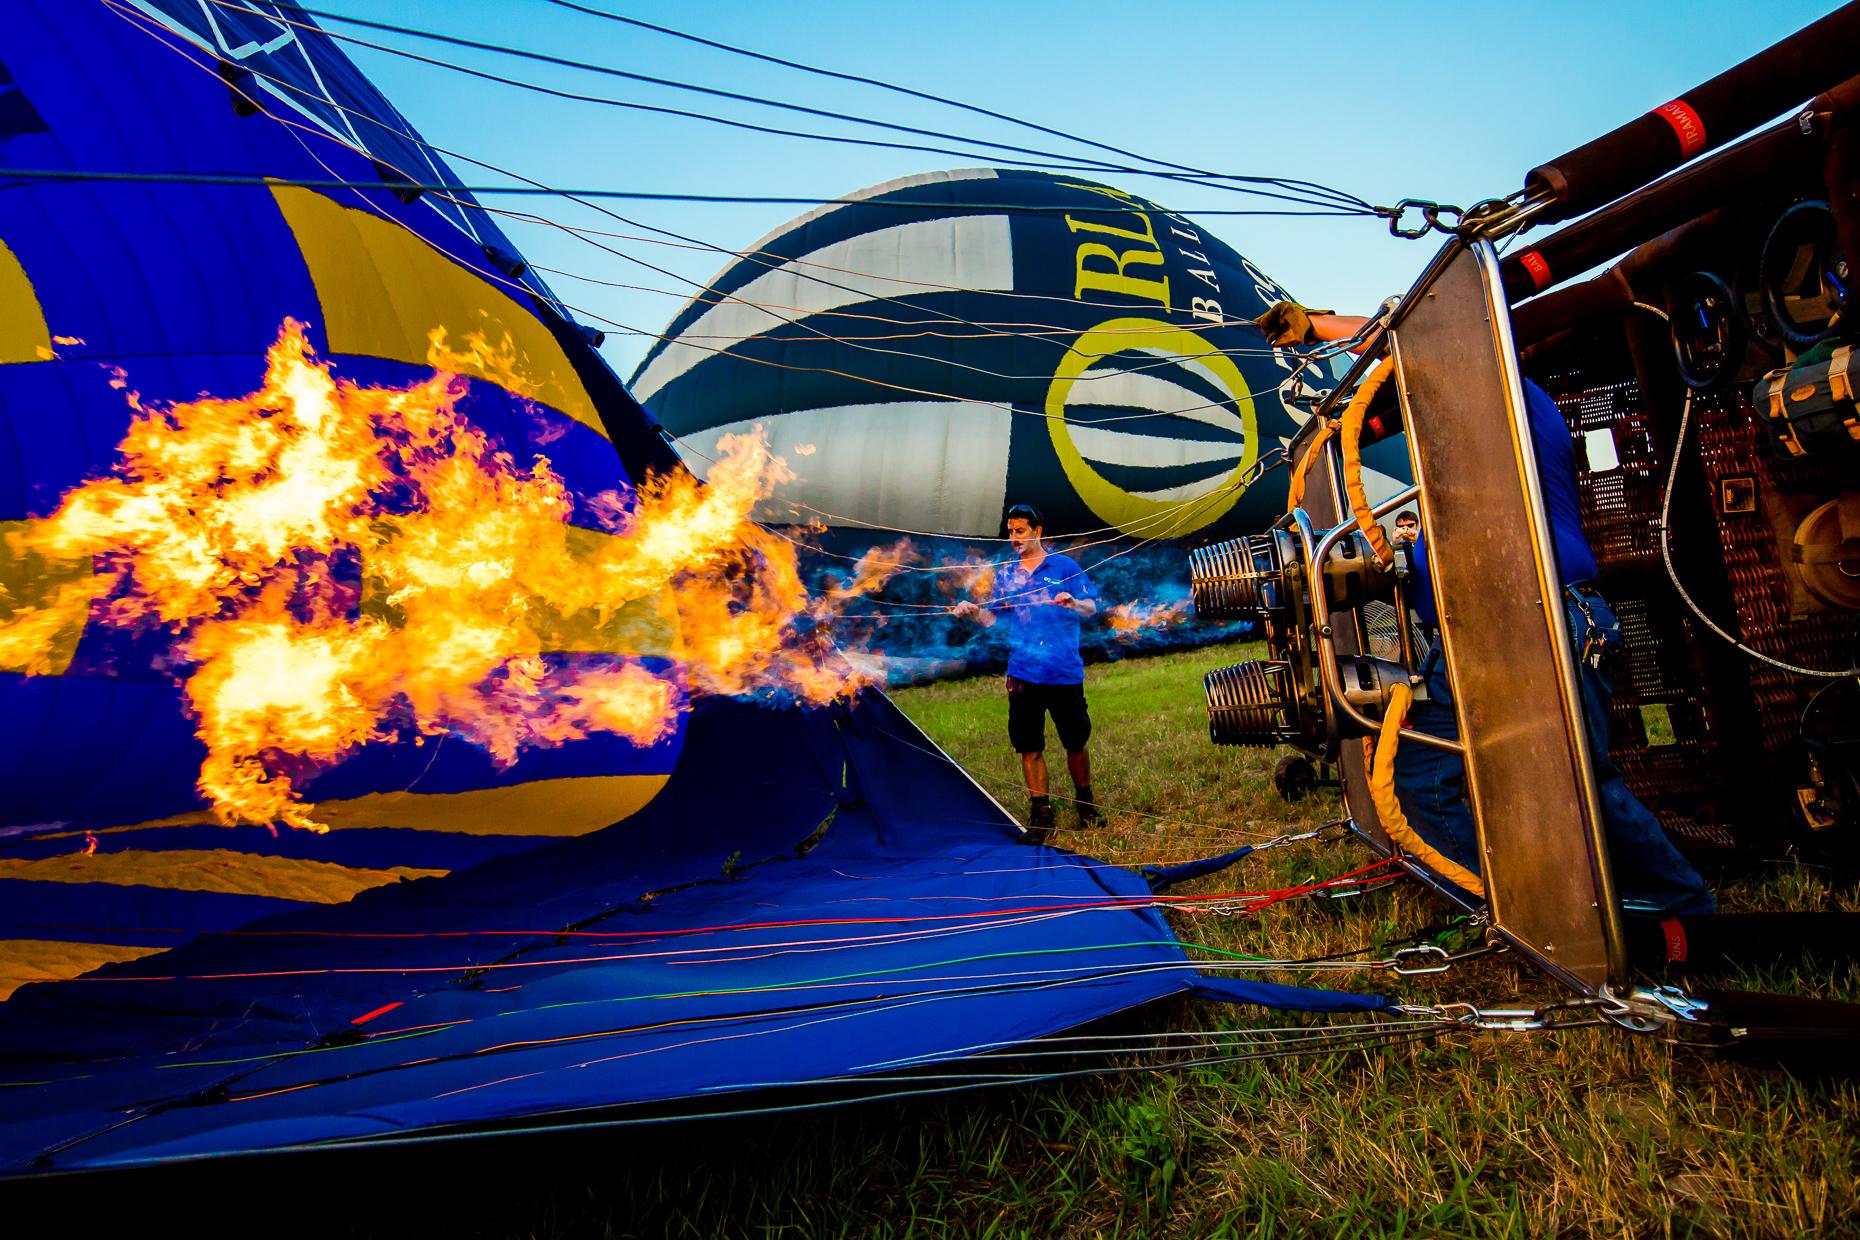 hot air balloon lock and land chip litherland orlando 0010.JPG